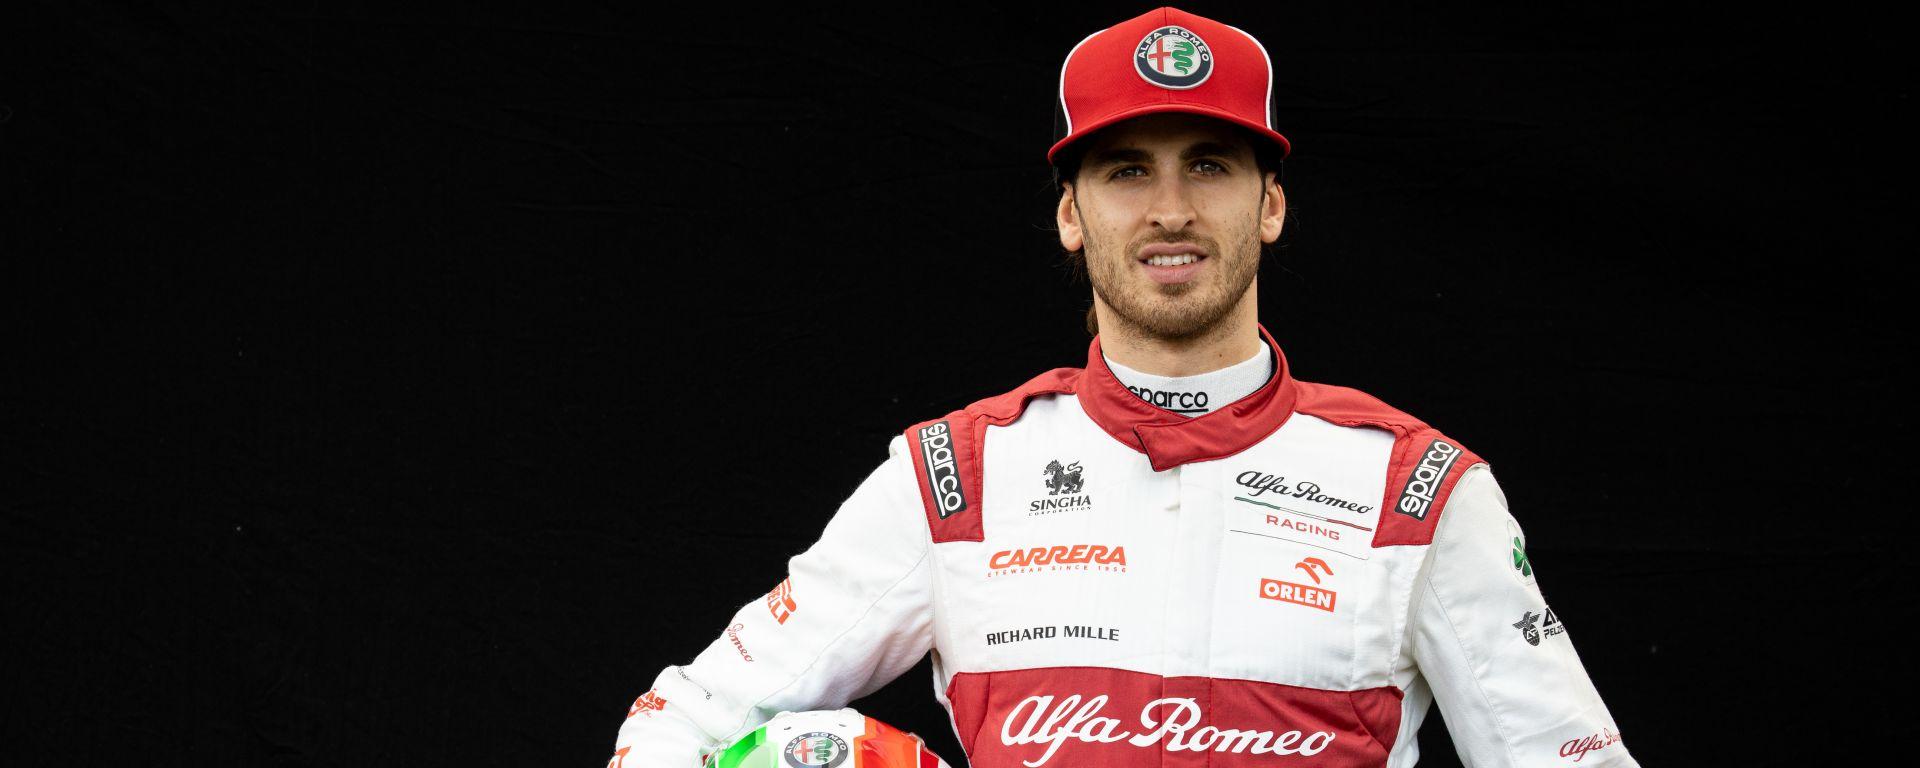 F1 GP Australia 2020, Melbourne: Antonio Giovinazzi (Alfa Romeo Racing)